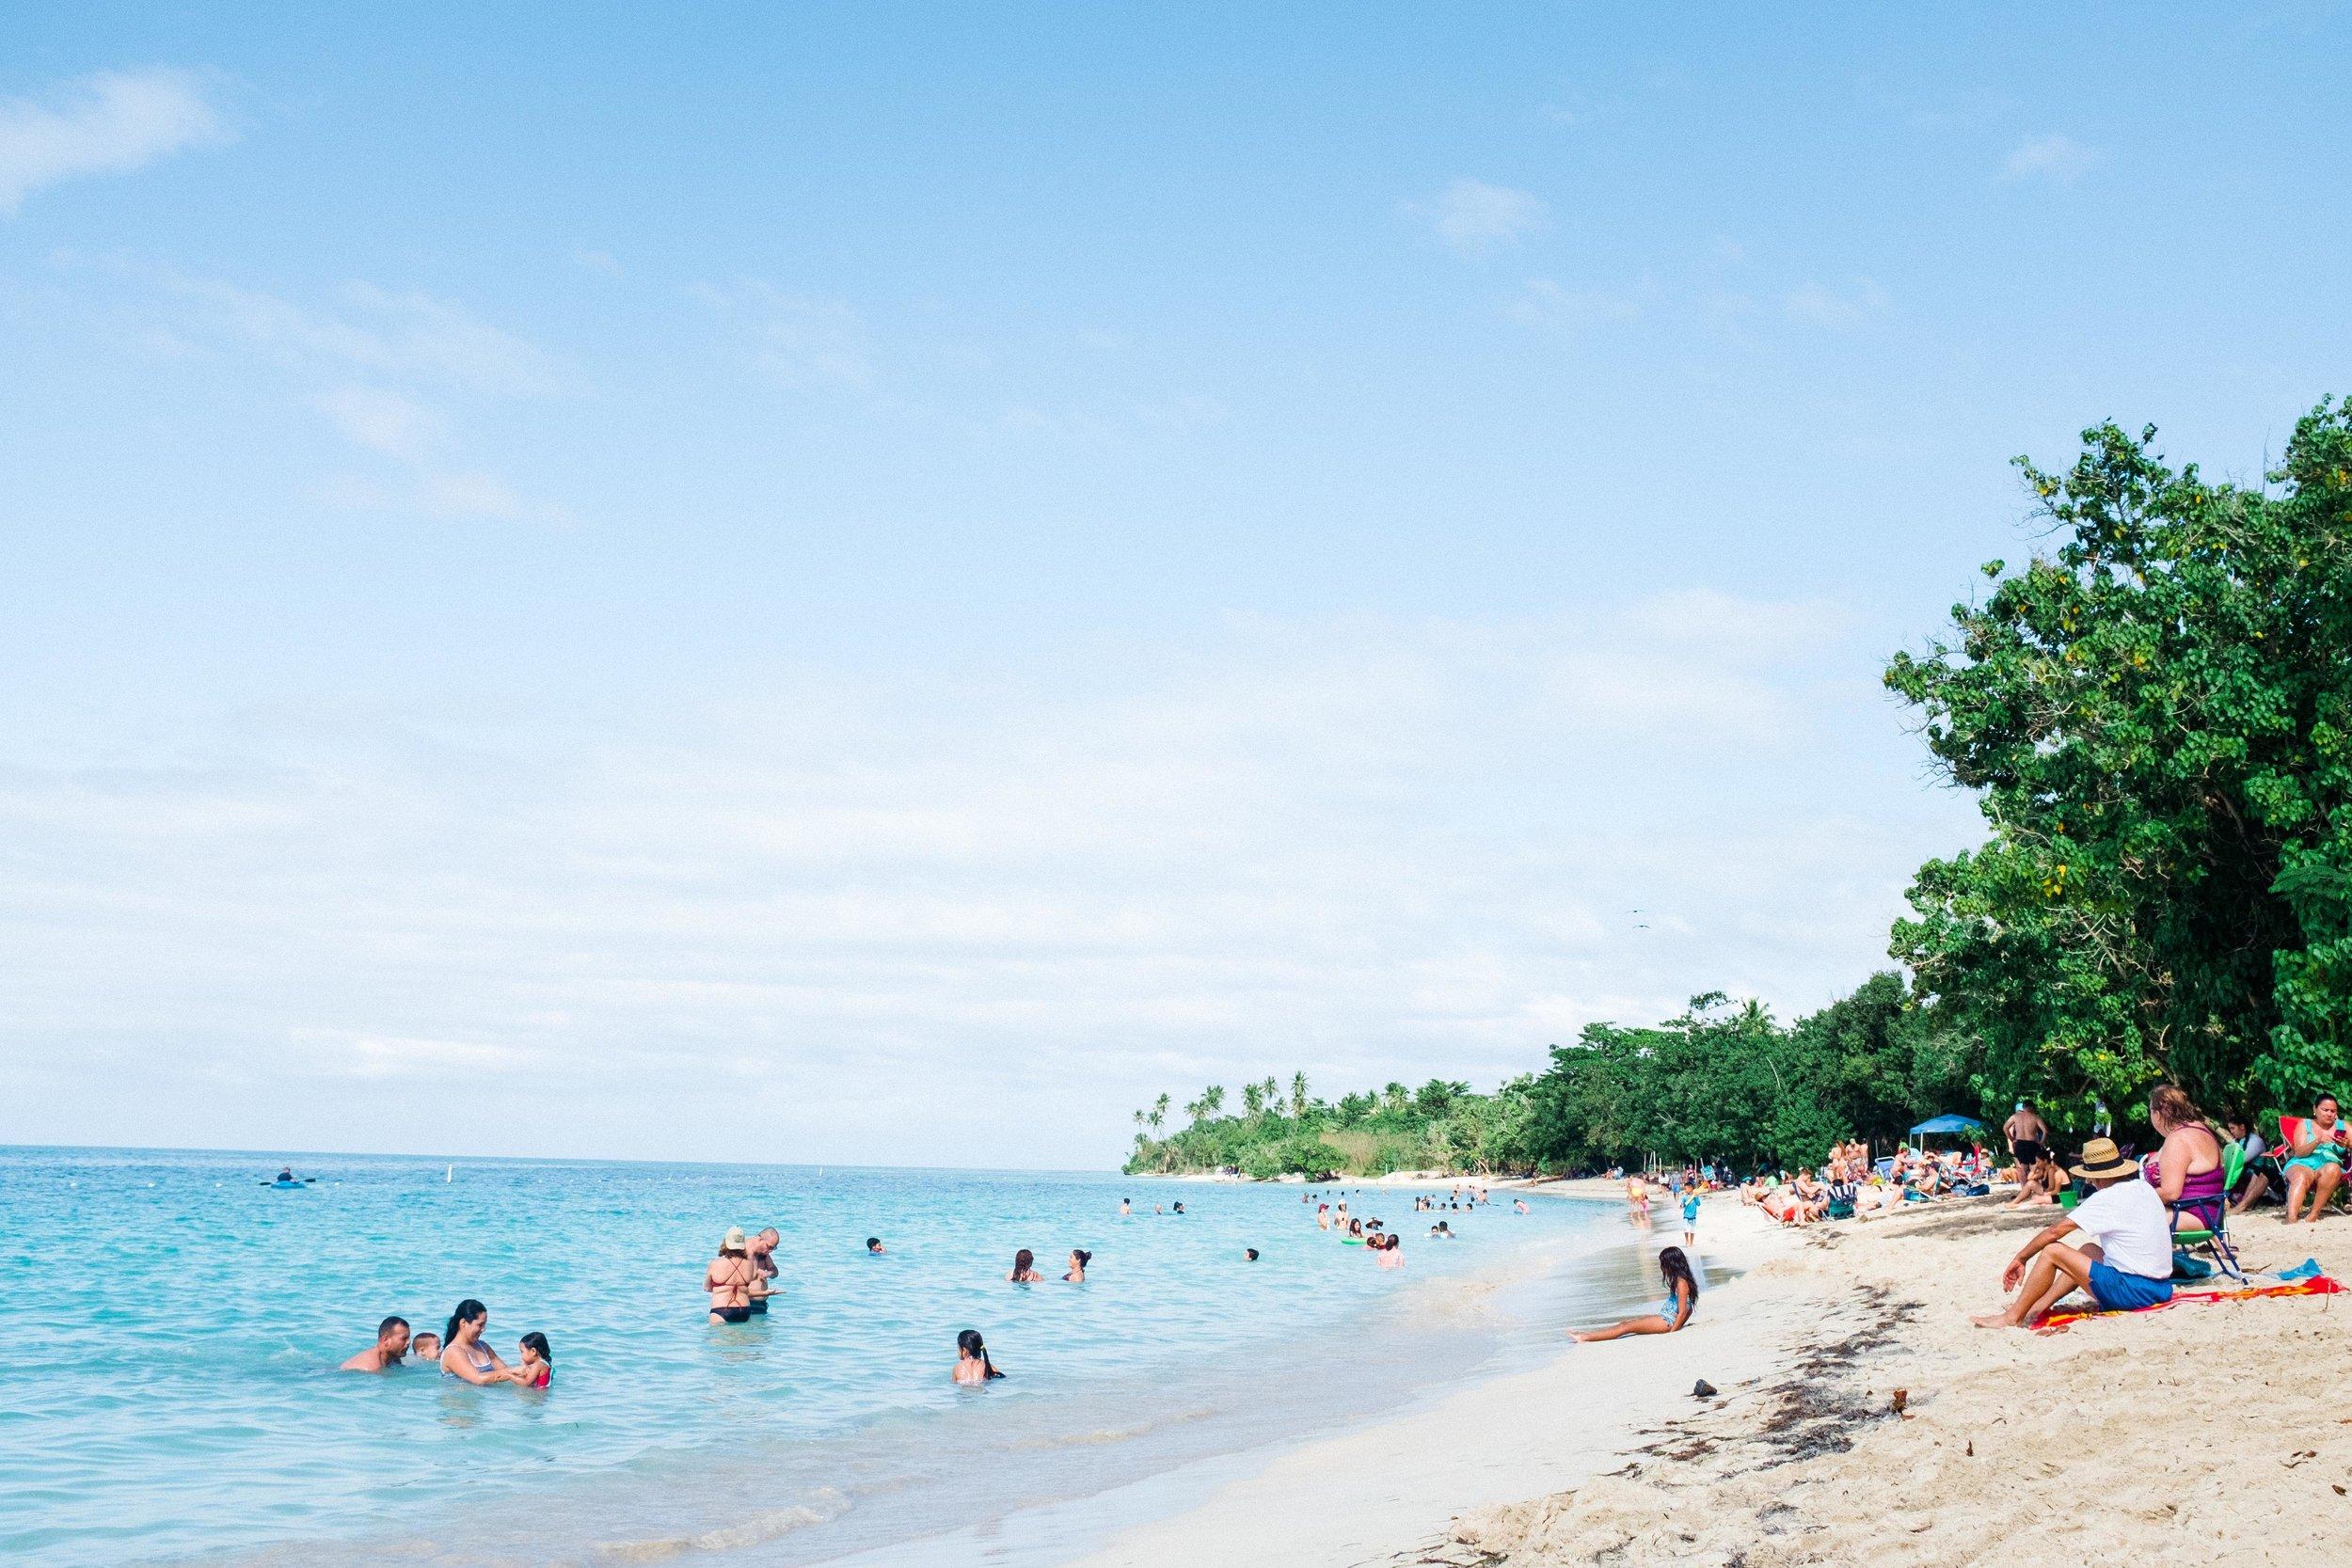 puerto-rico-cabo-rojo-playa-buye-beach-7549.jpg